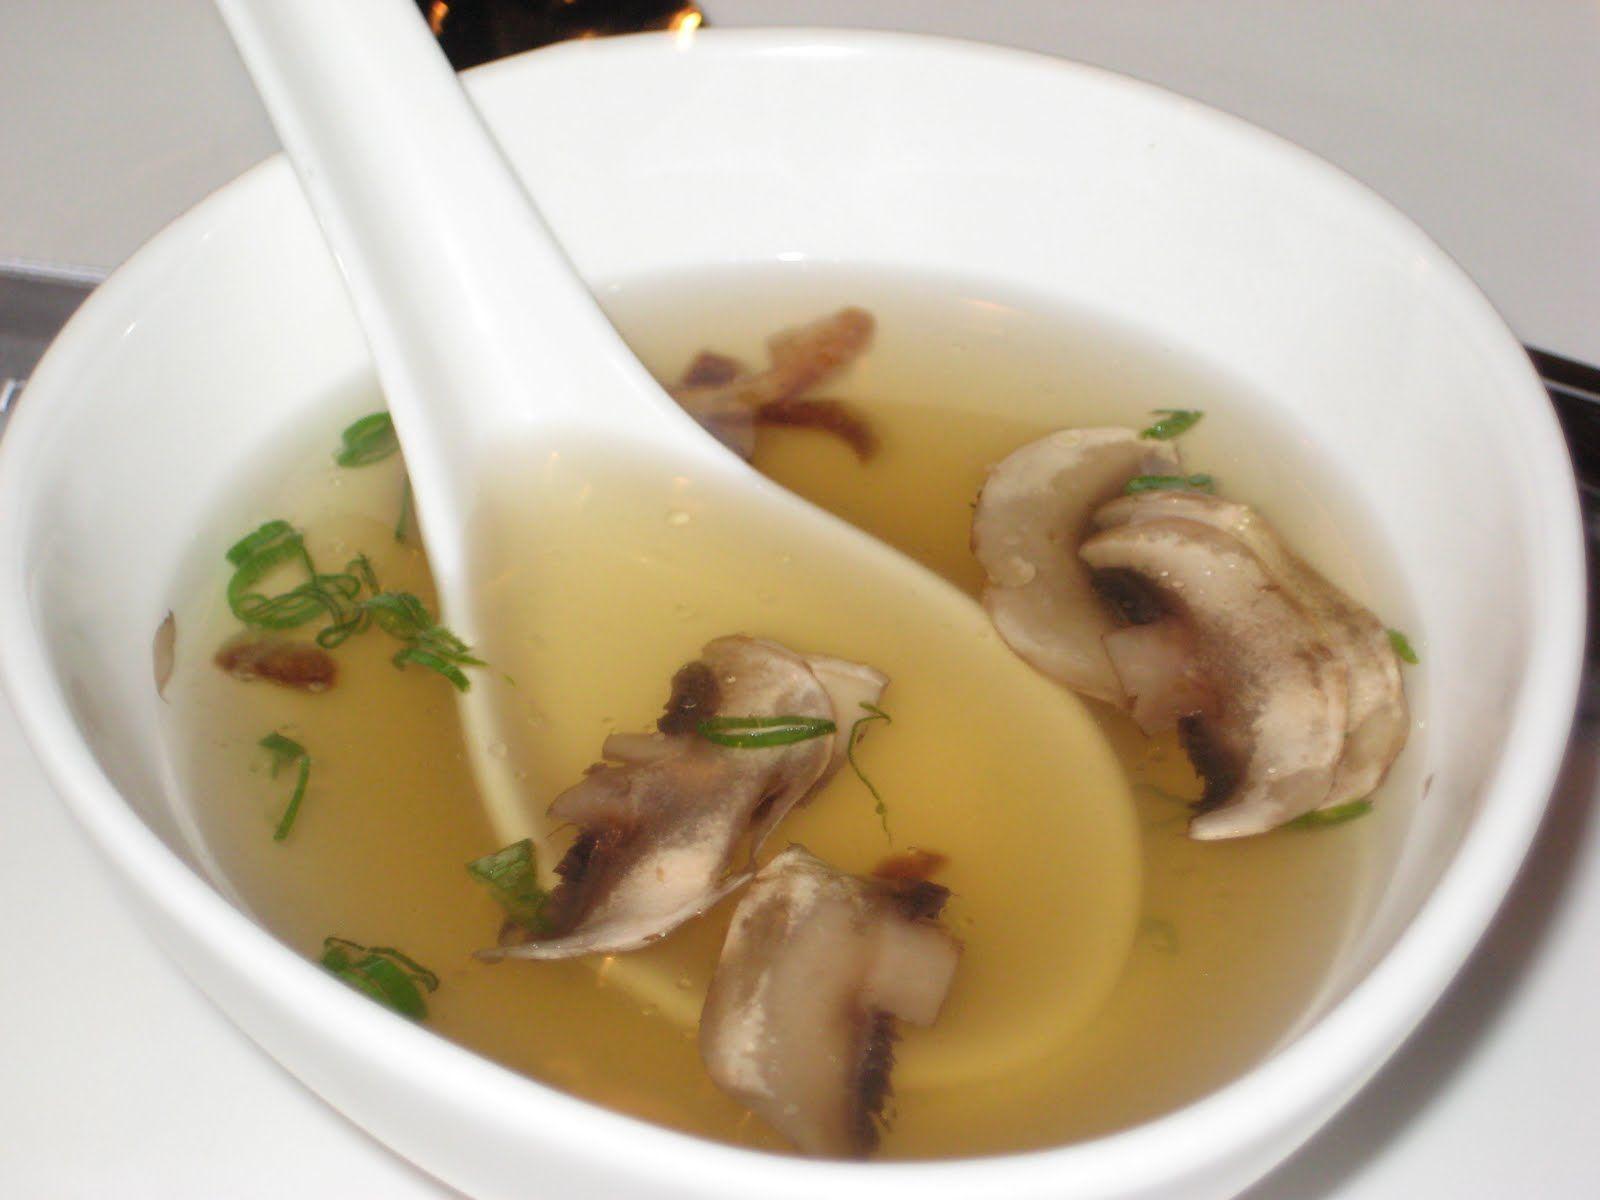 die besten 25 clear soup japanese ideen auf pinterest hibachi suppe entgiftende lebensmittel. Black Bedroom Furniture Sets. Home Design Ideas